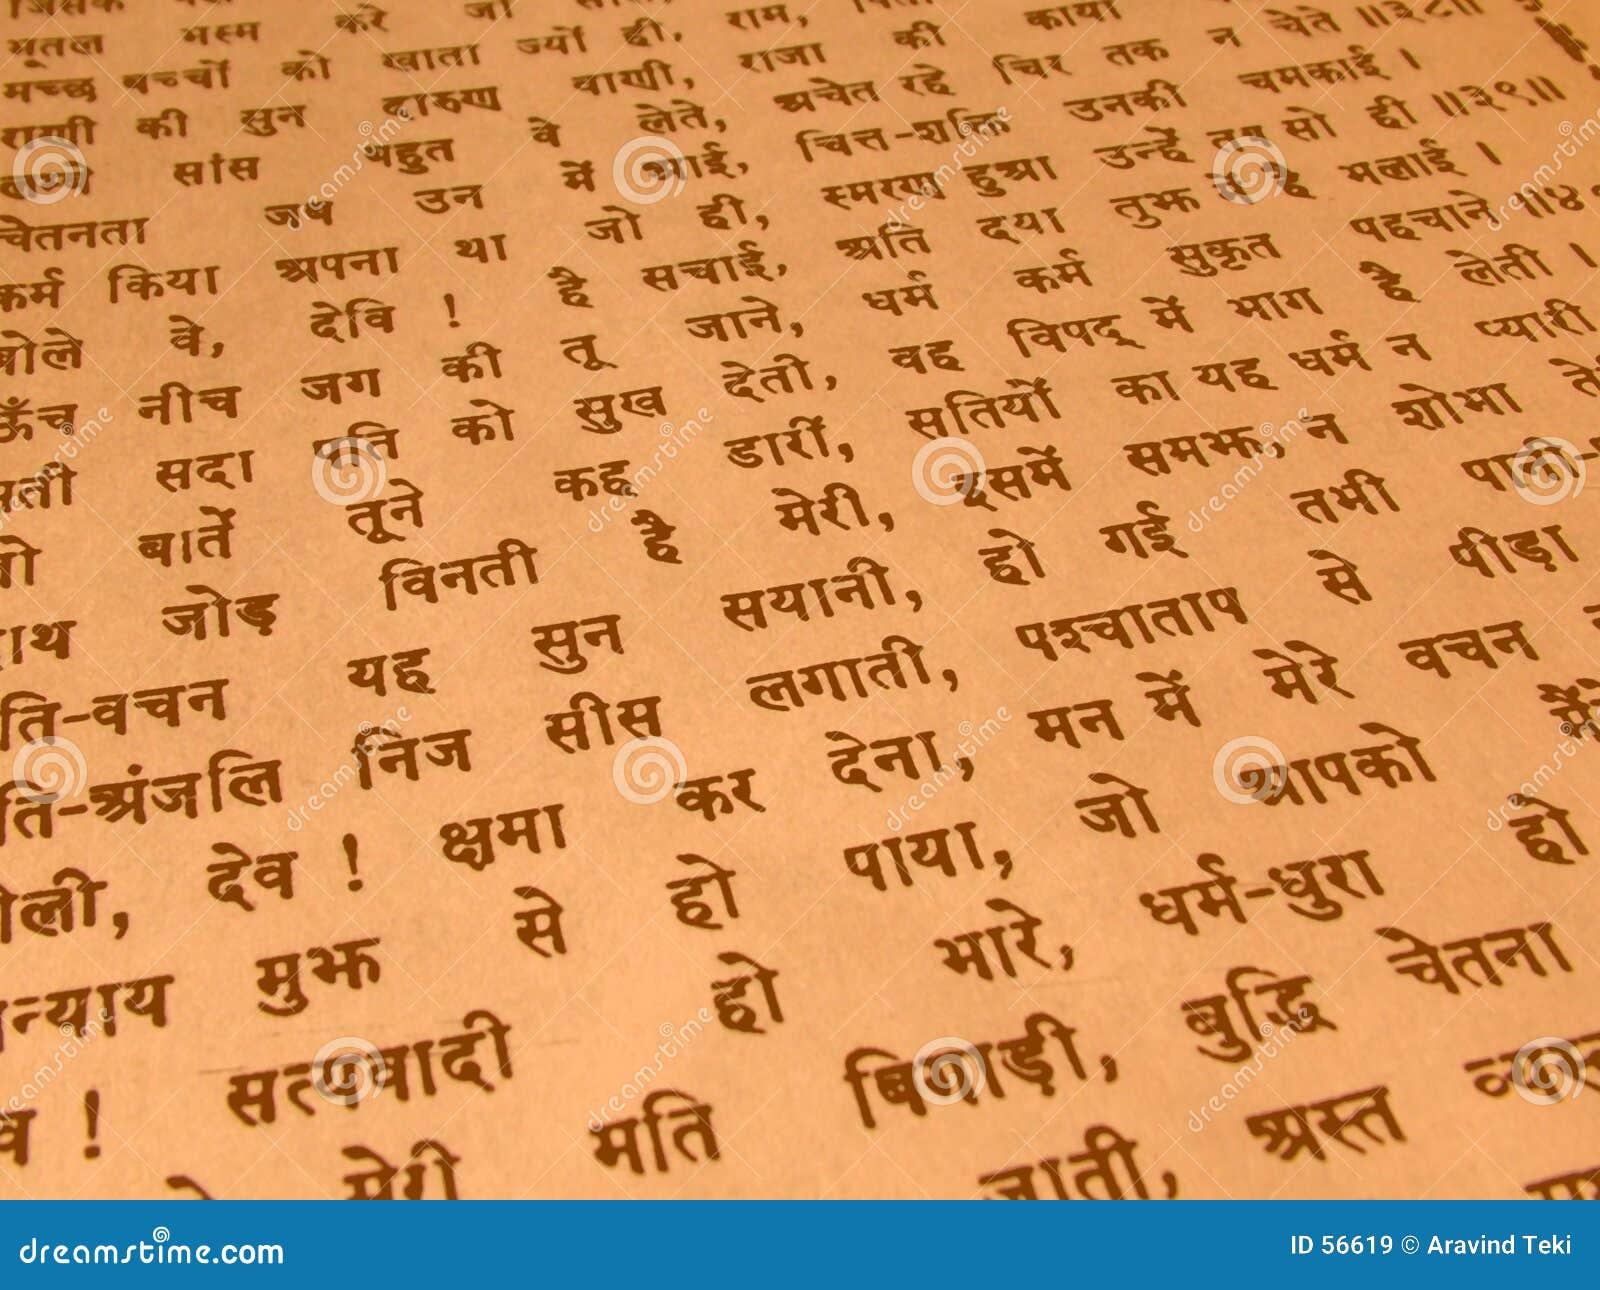 Download Épisode de Ramayana image stock. Image du épique, ramayana - 56619